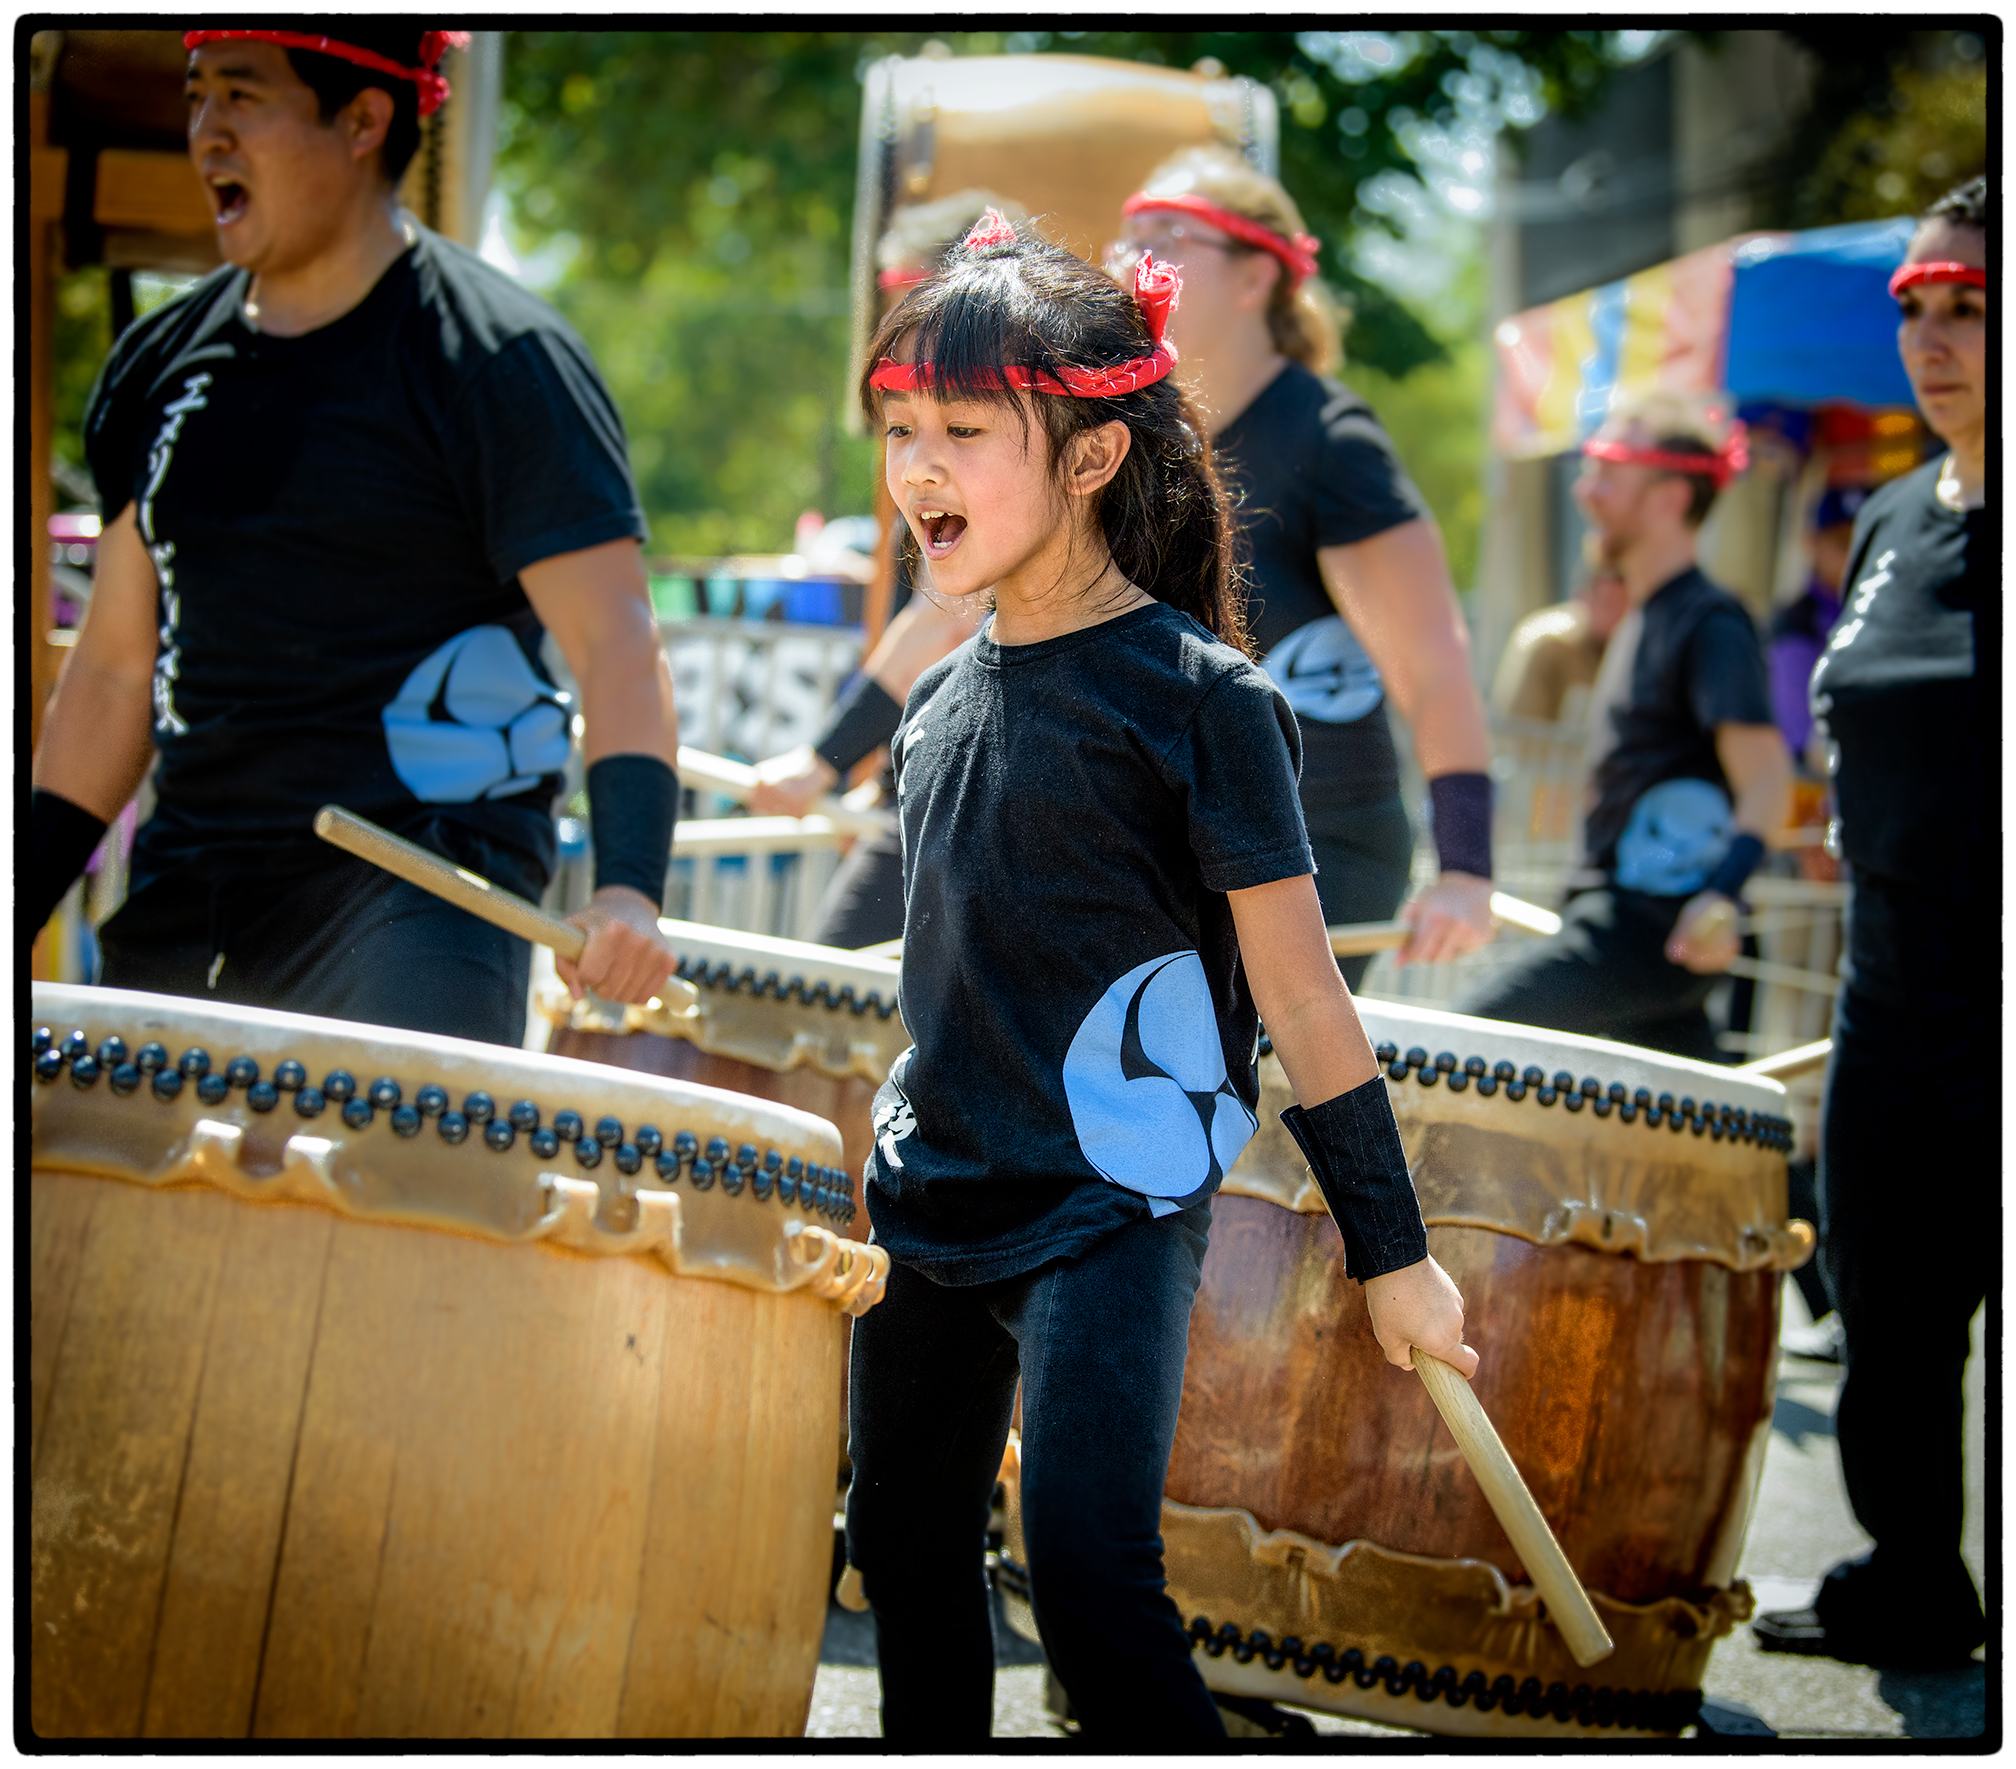 Taiko drummer, Solano Stroll 2017